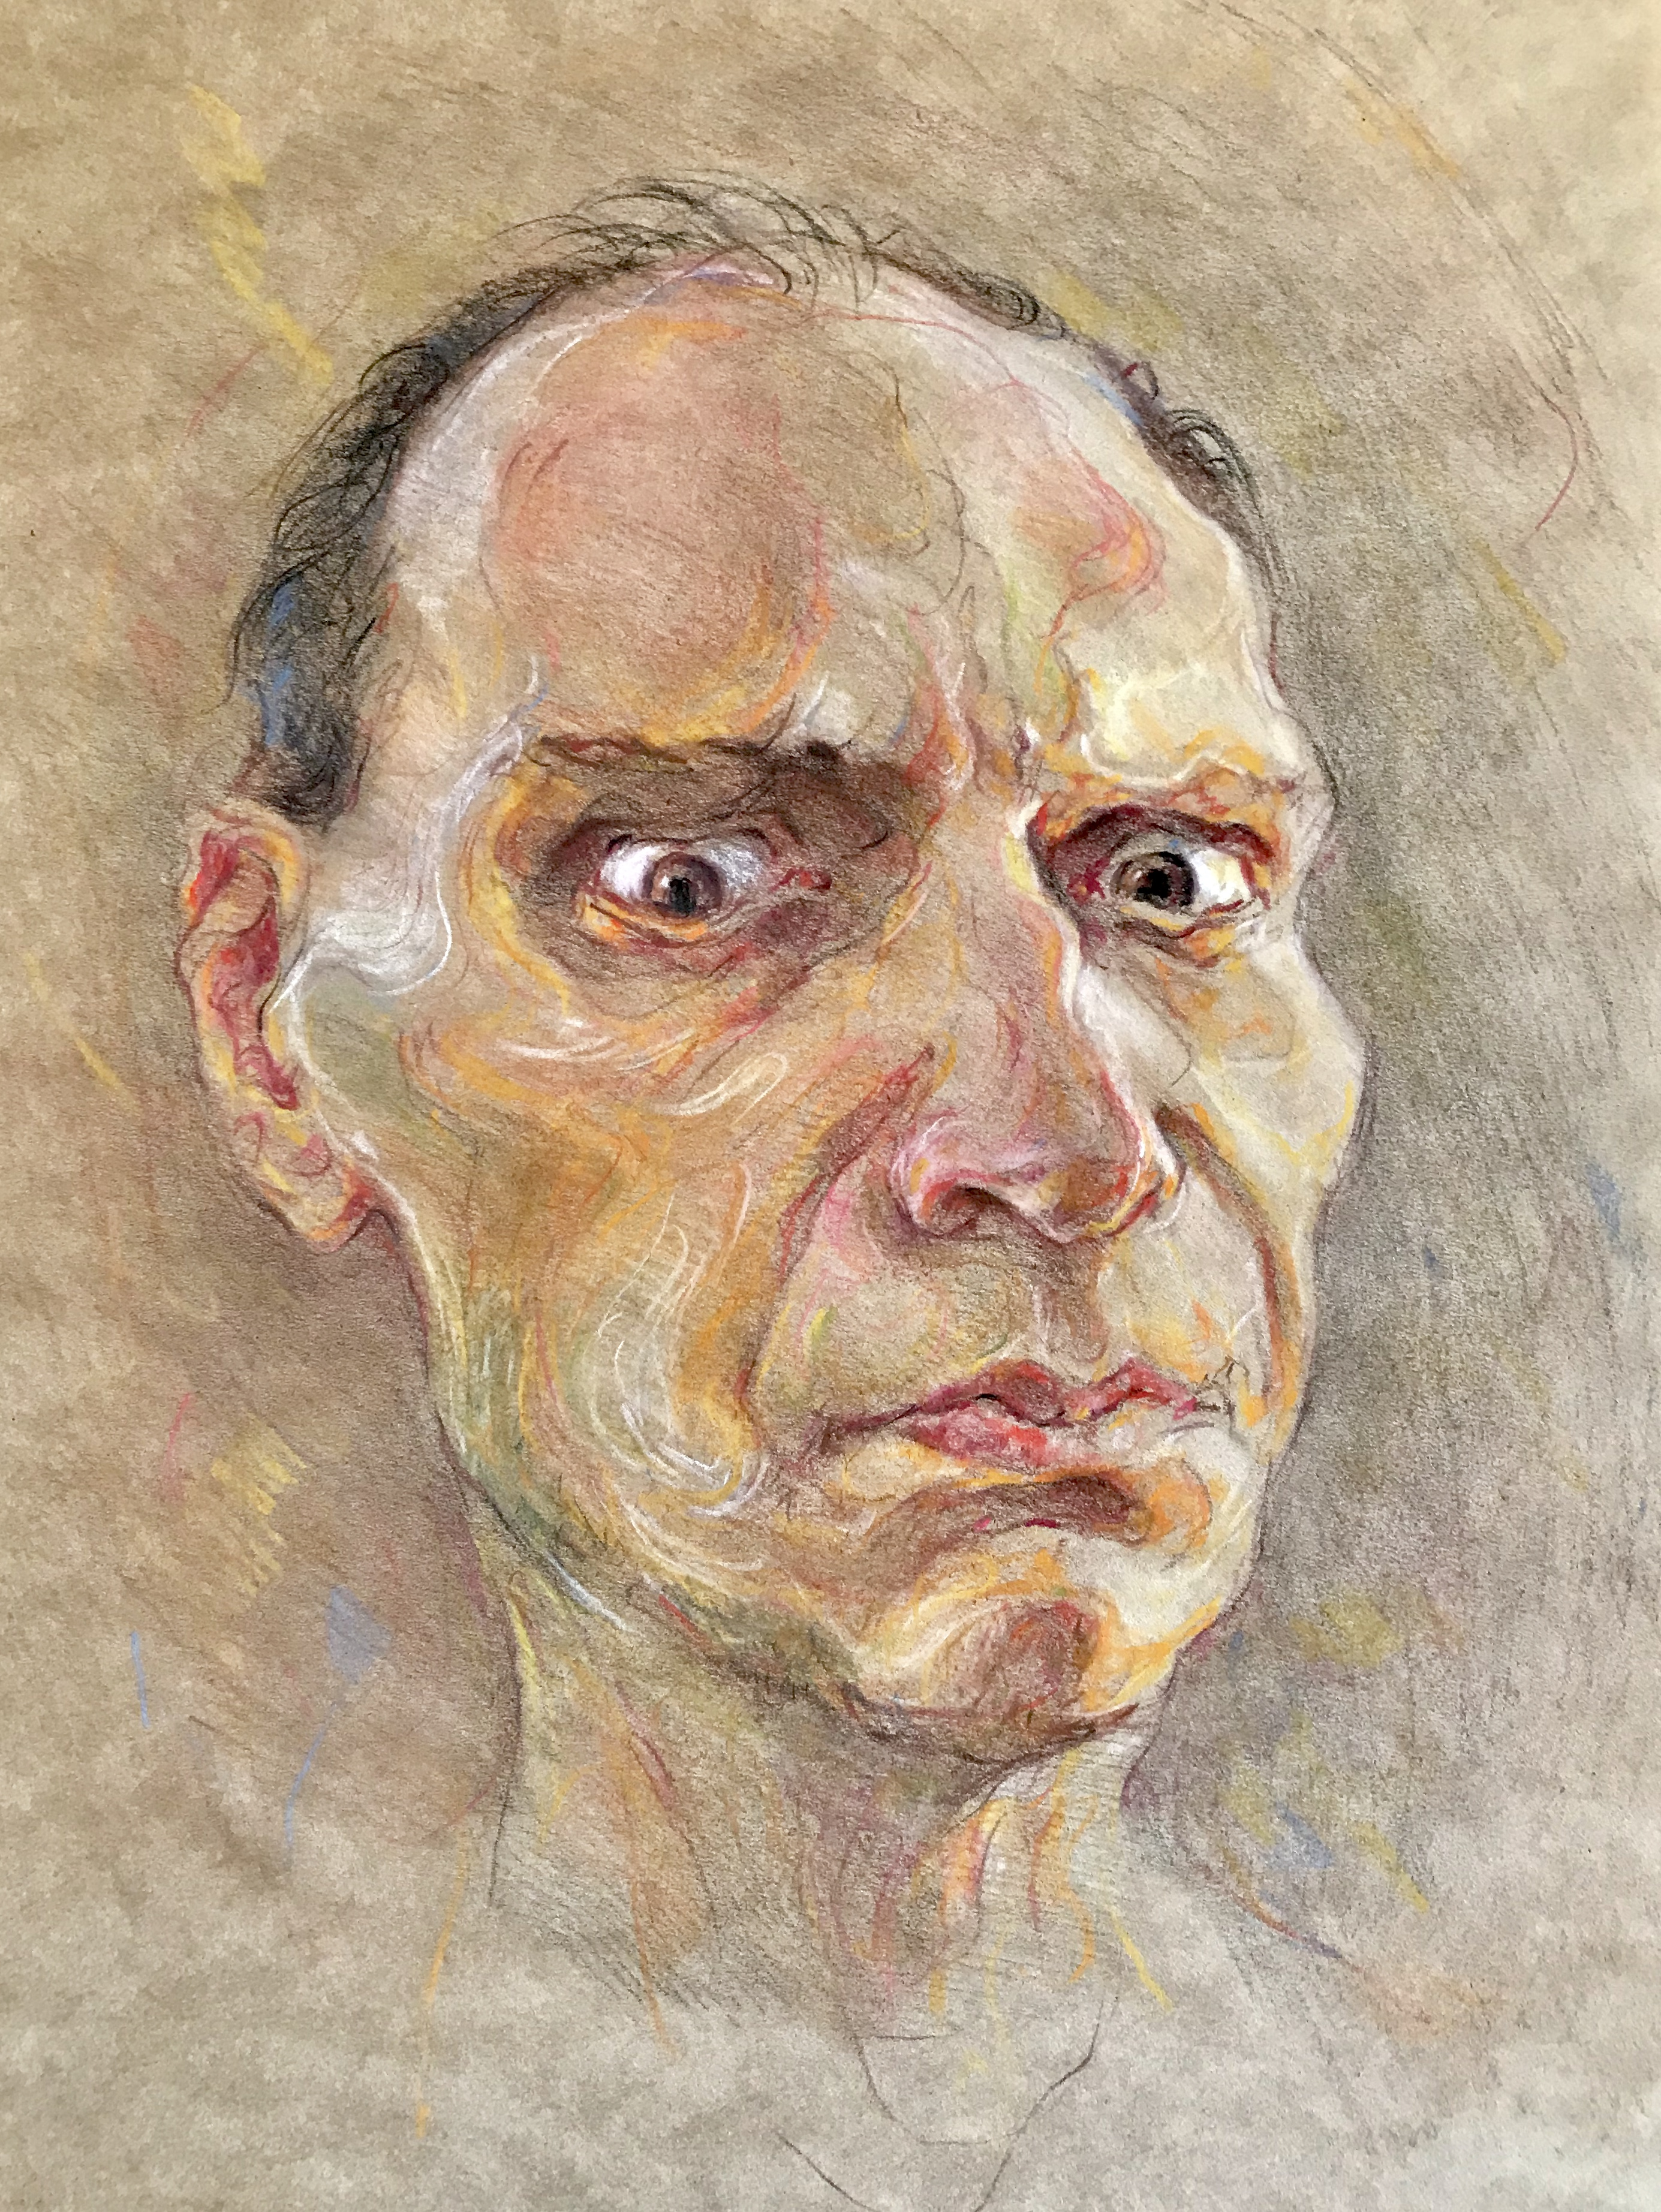 Portrait of unknown person